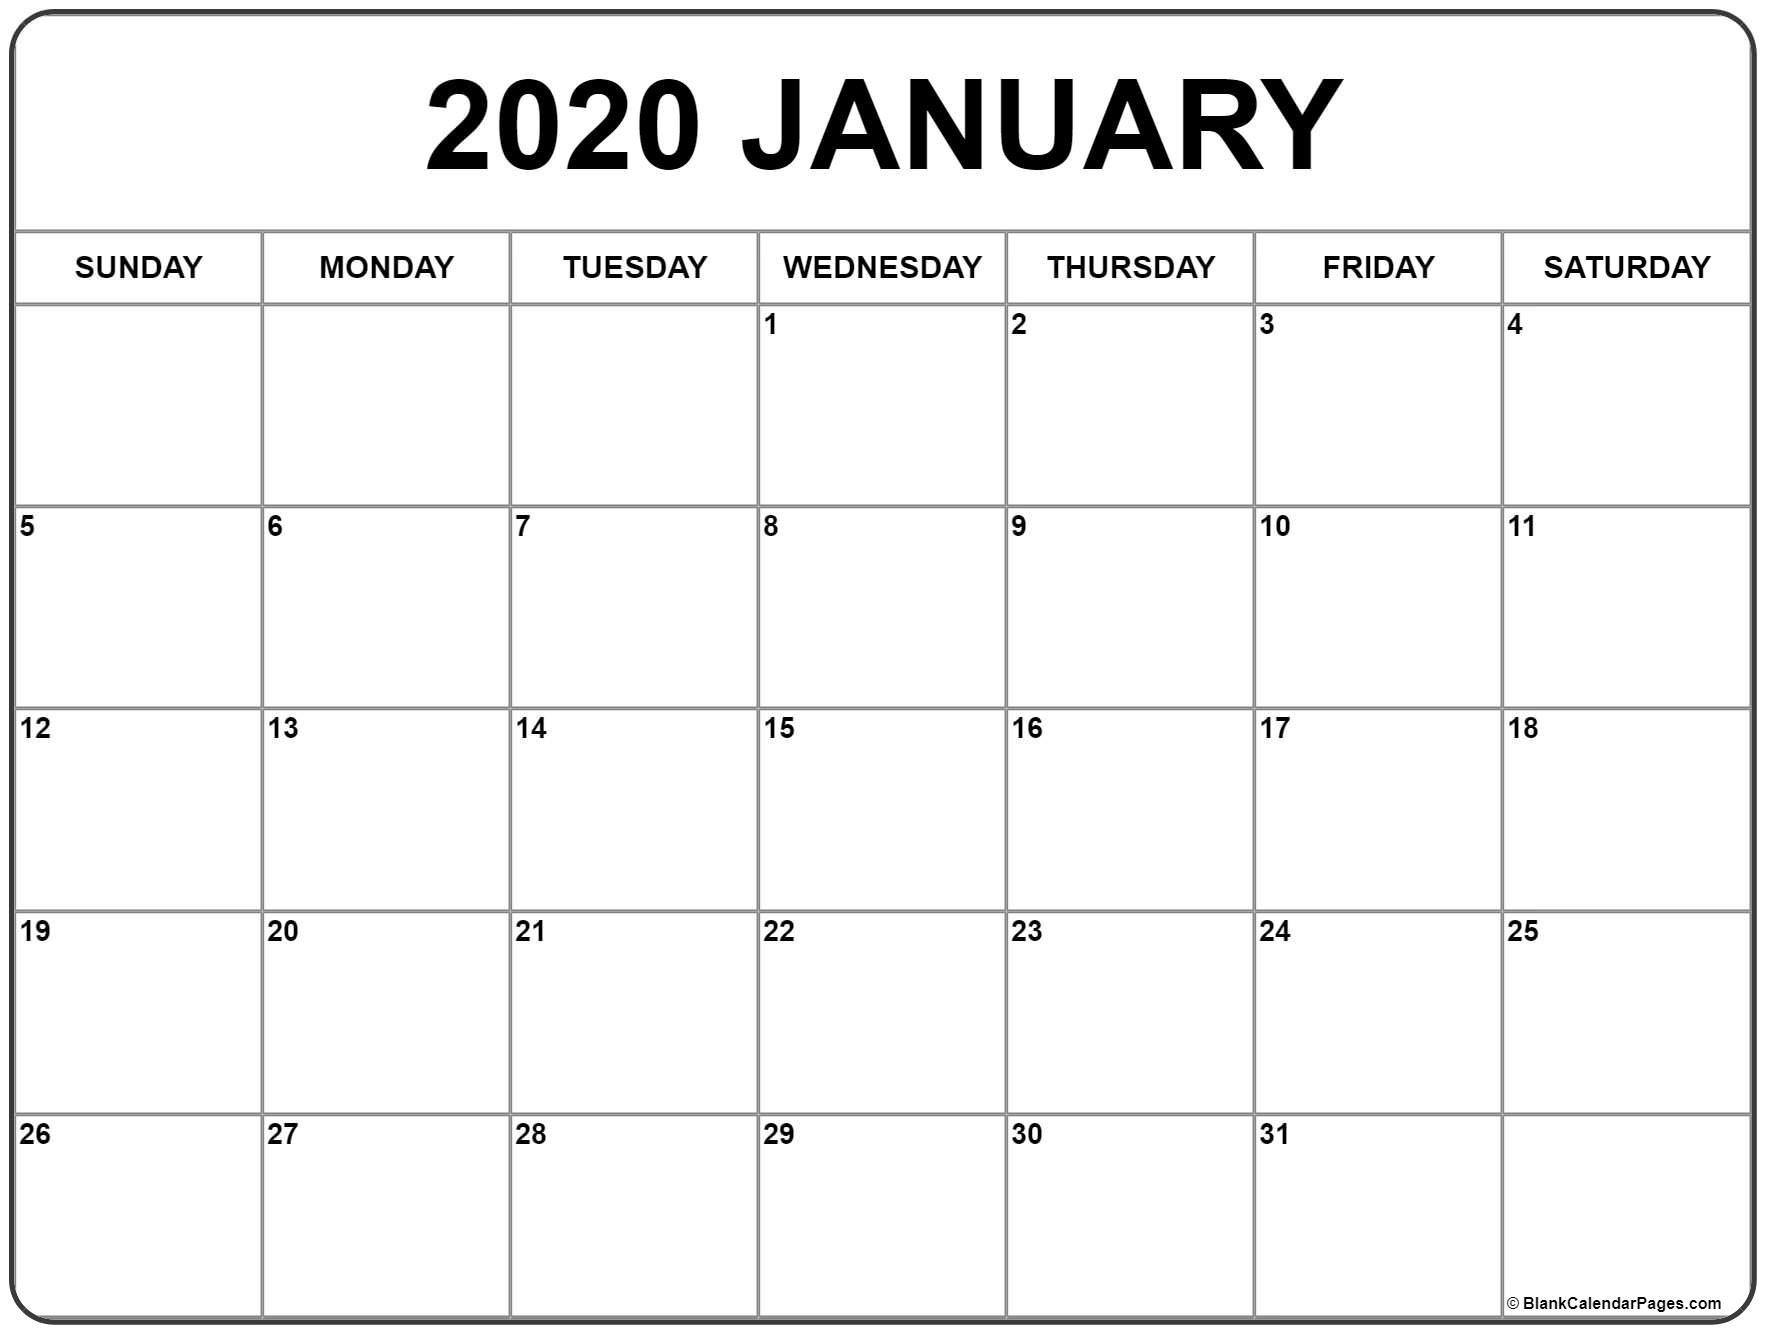 Printable 2020 Monthly Calendar - Remar-Calendar Labs Monday Start Monthly Calendar